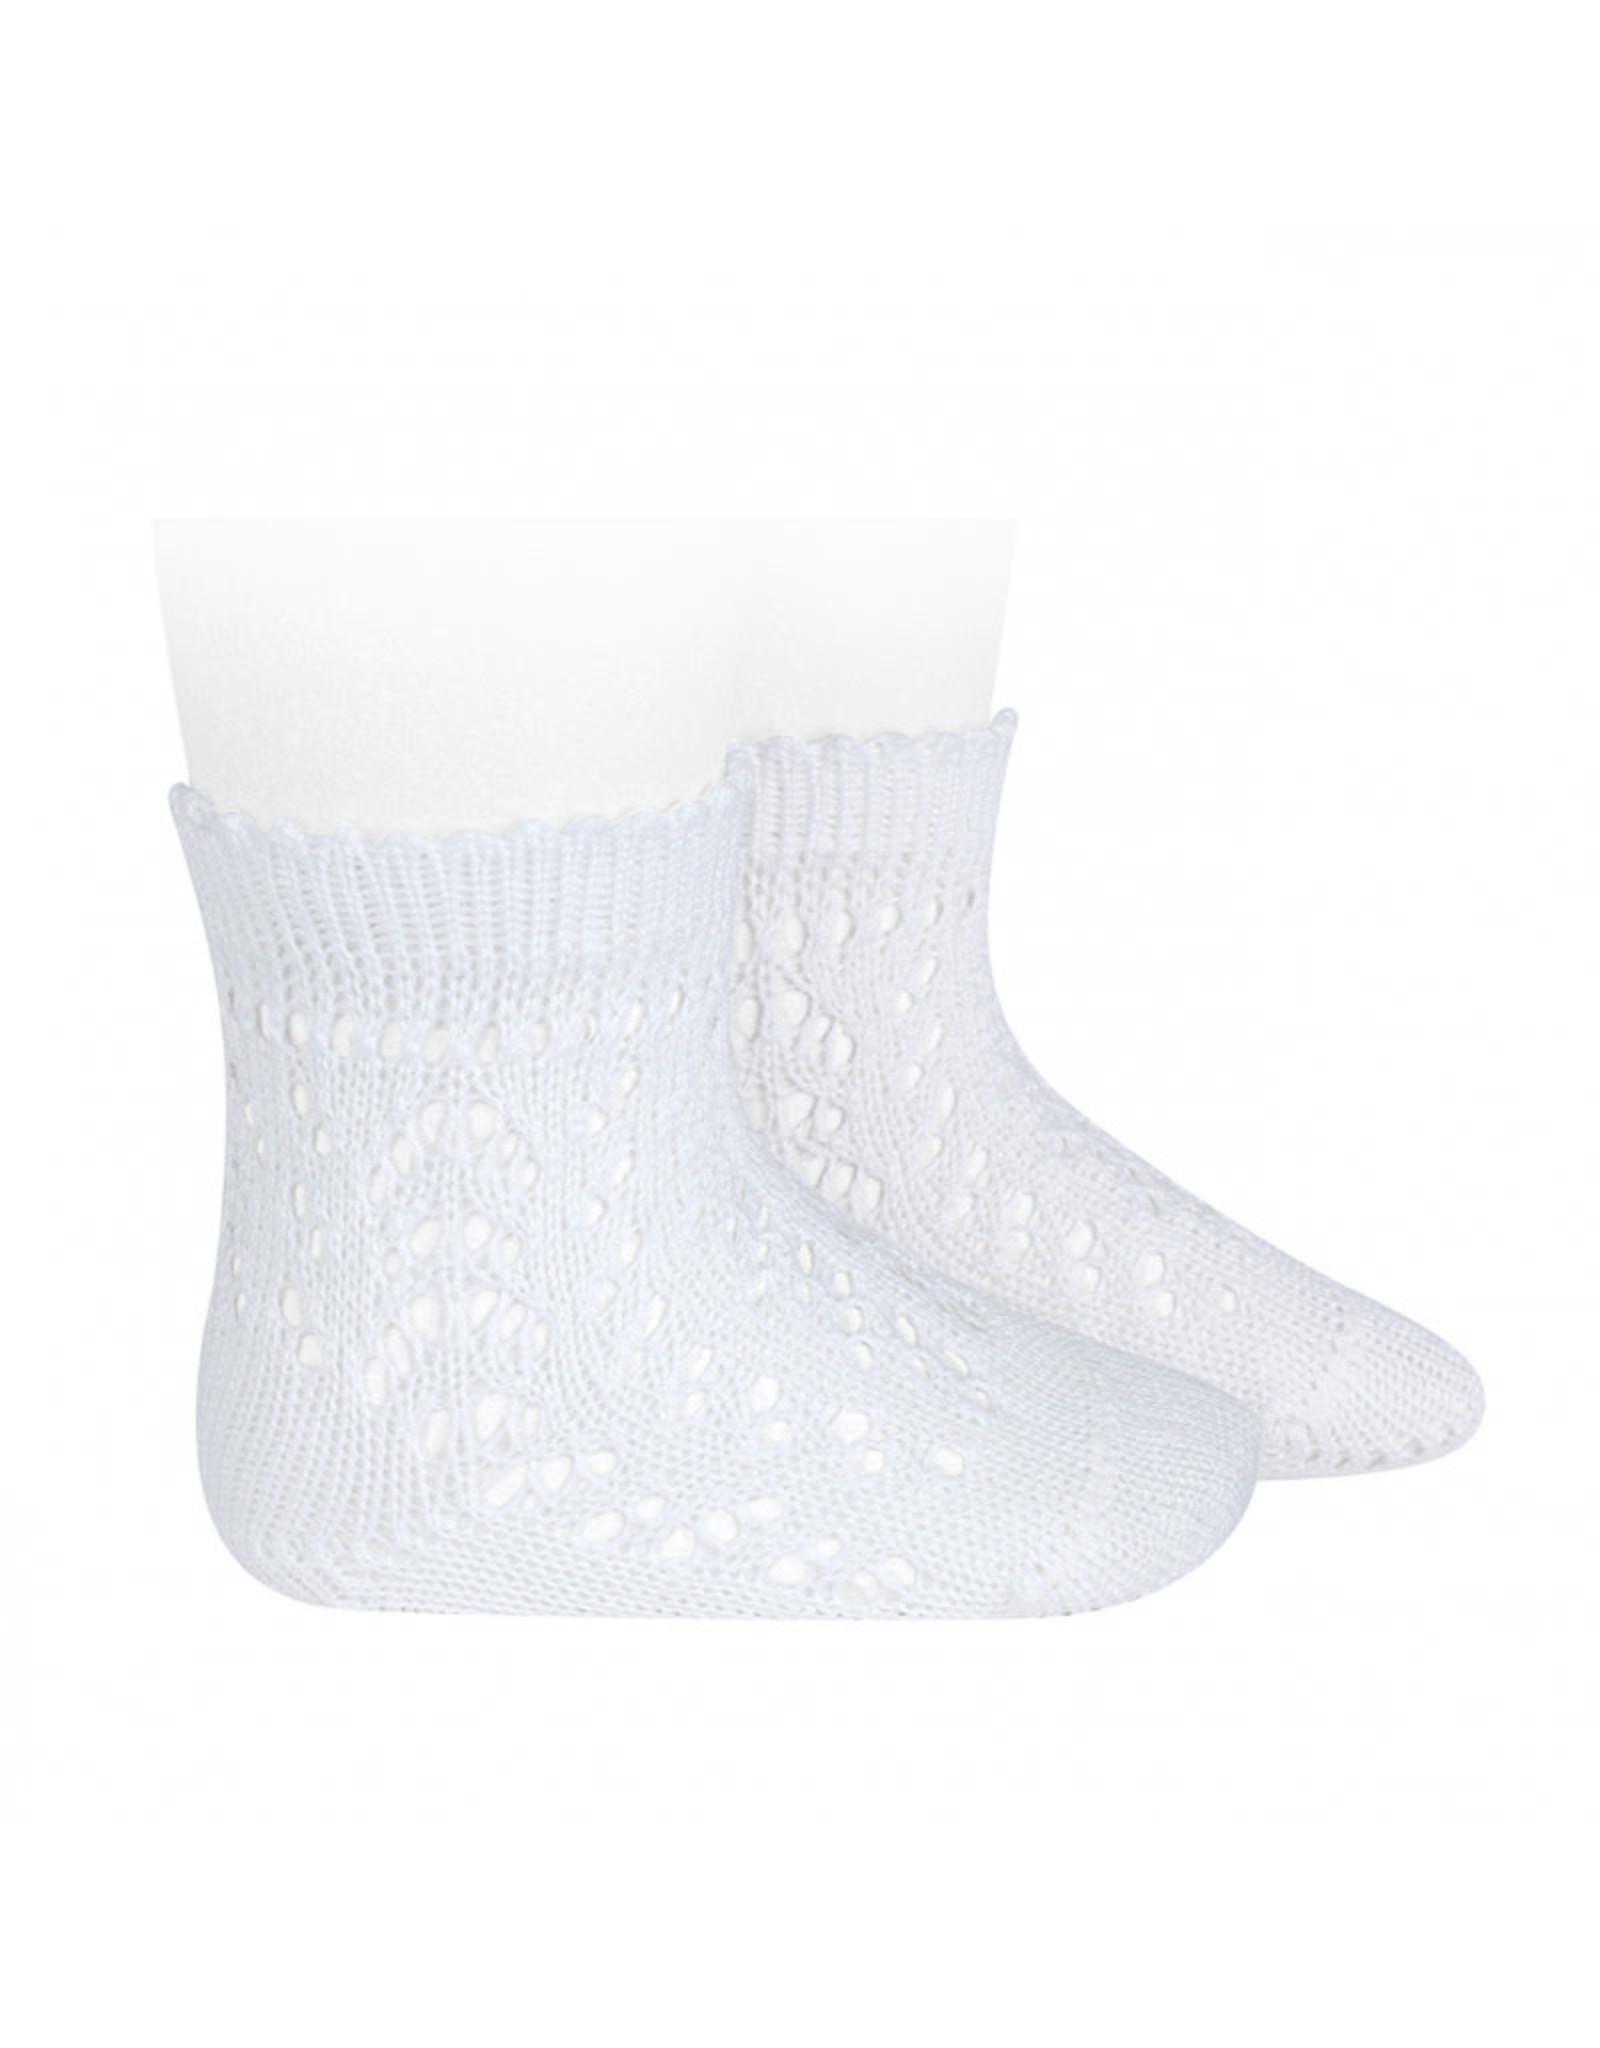 CONDOR White Openwork Short Socks